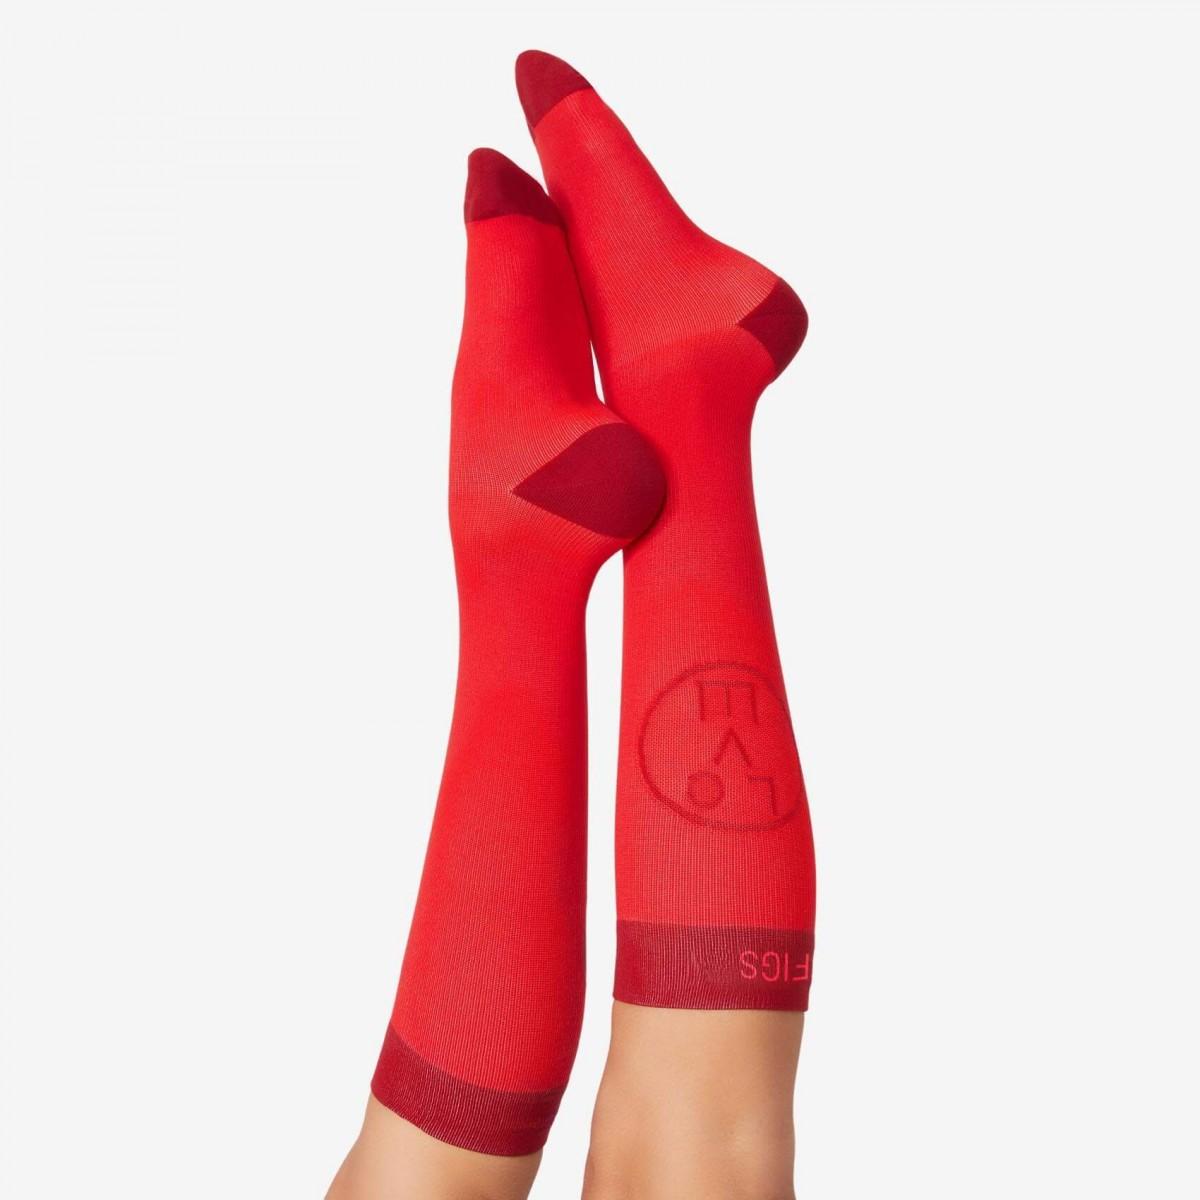 Womens Compression Socks EKG Sock in 2020 Women, Socks